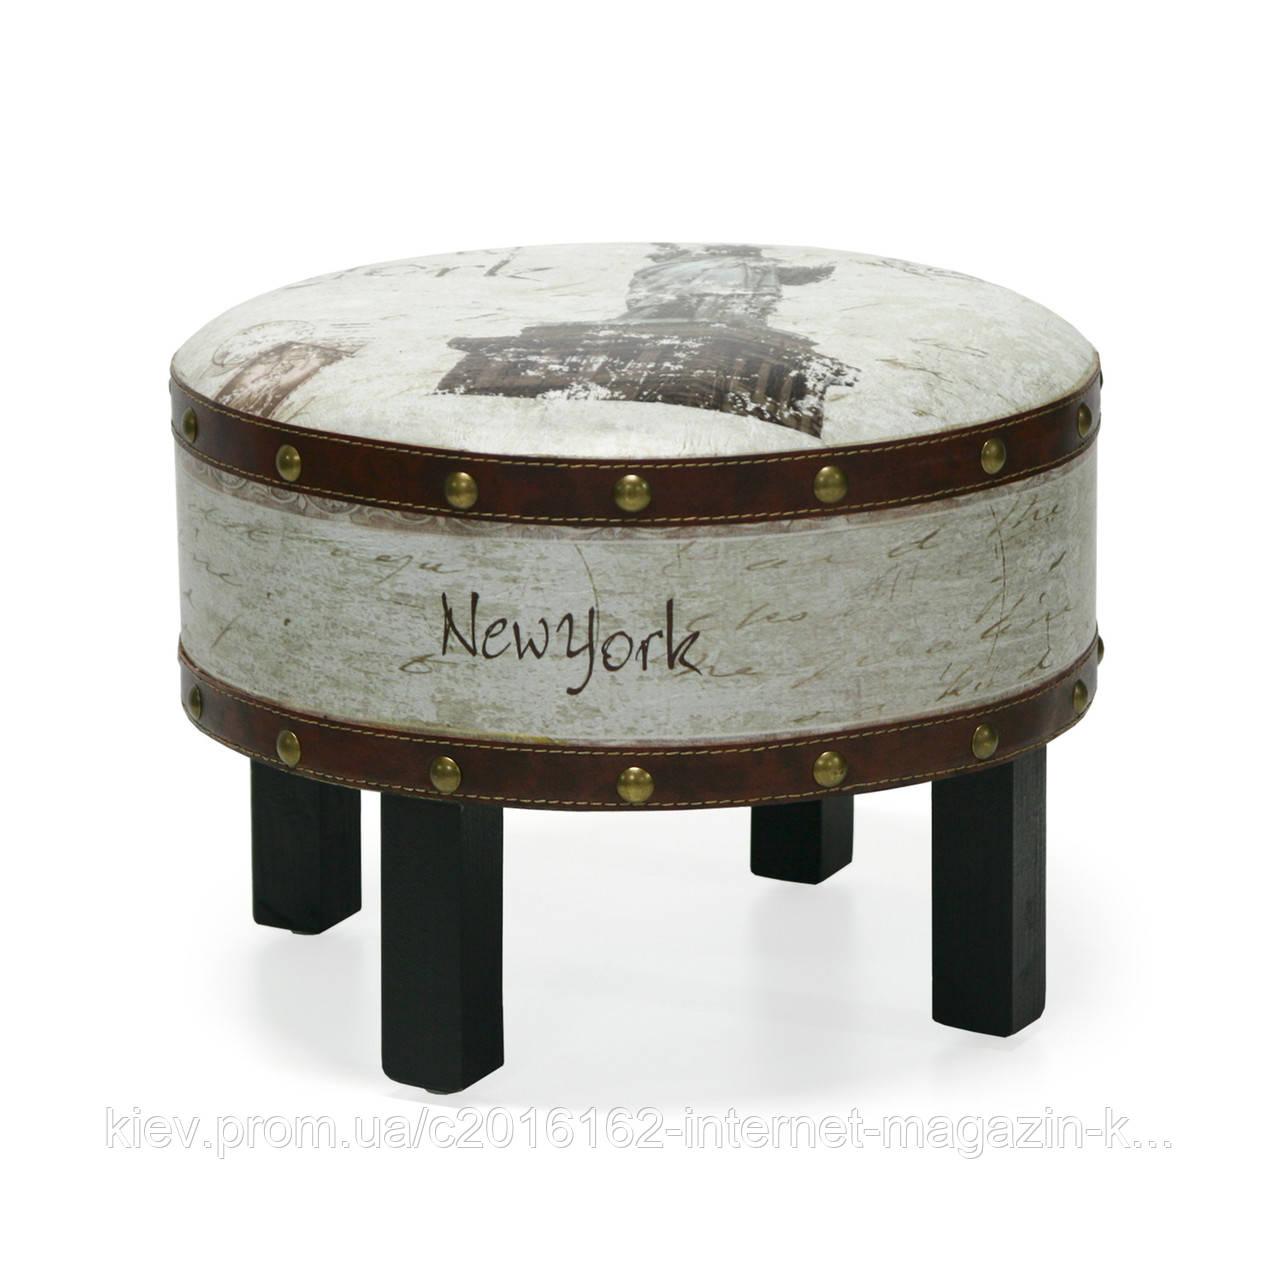 Стул-пуфик Home4You NEW YORK D41xH31cm  wood/leather